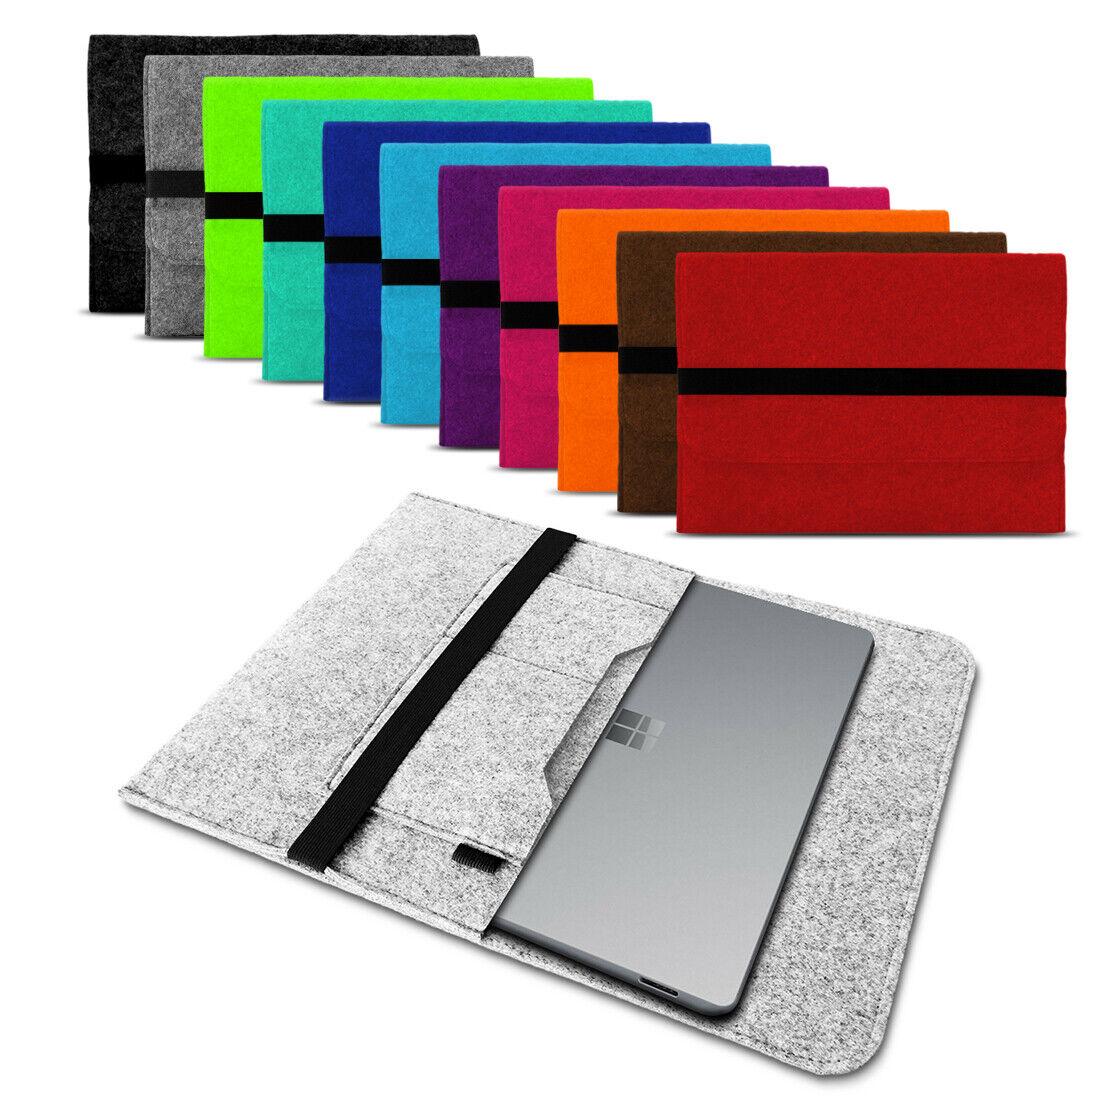 Laptop Hülle Filz Sleeve Ultrabook Laptop Tasche Case für Apple Lenovo Asus Dell